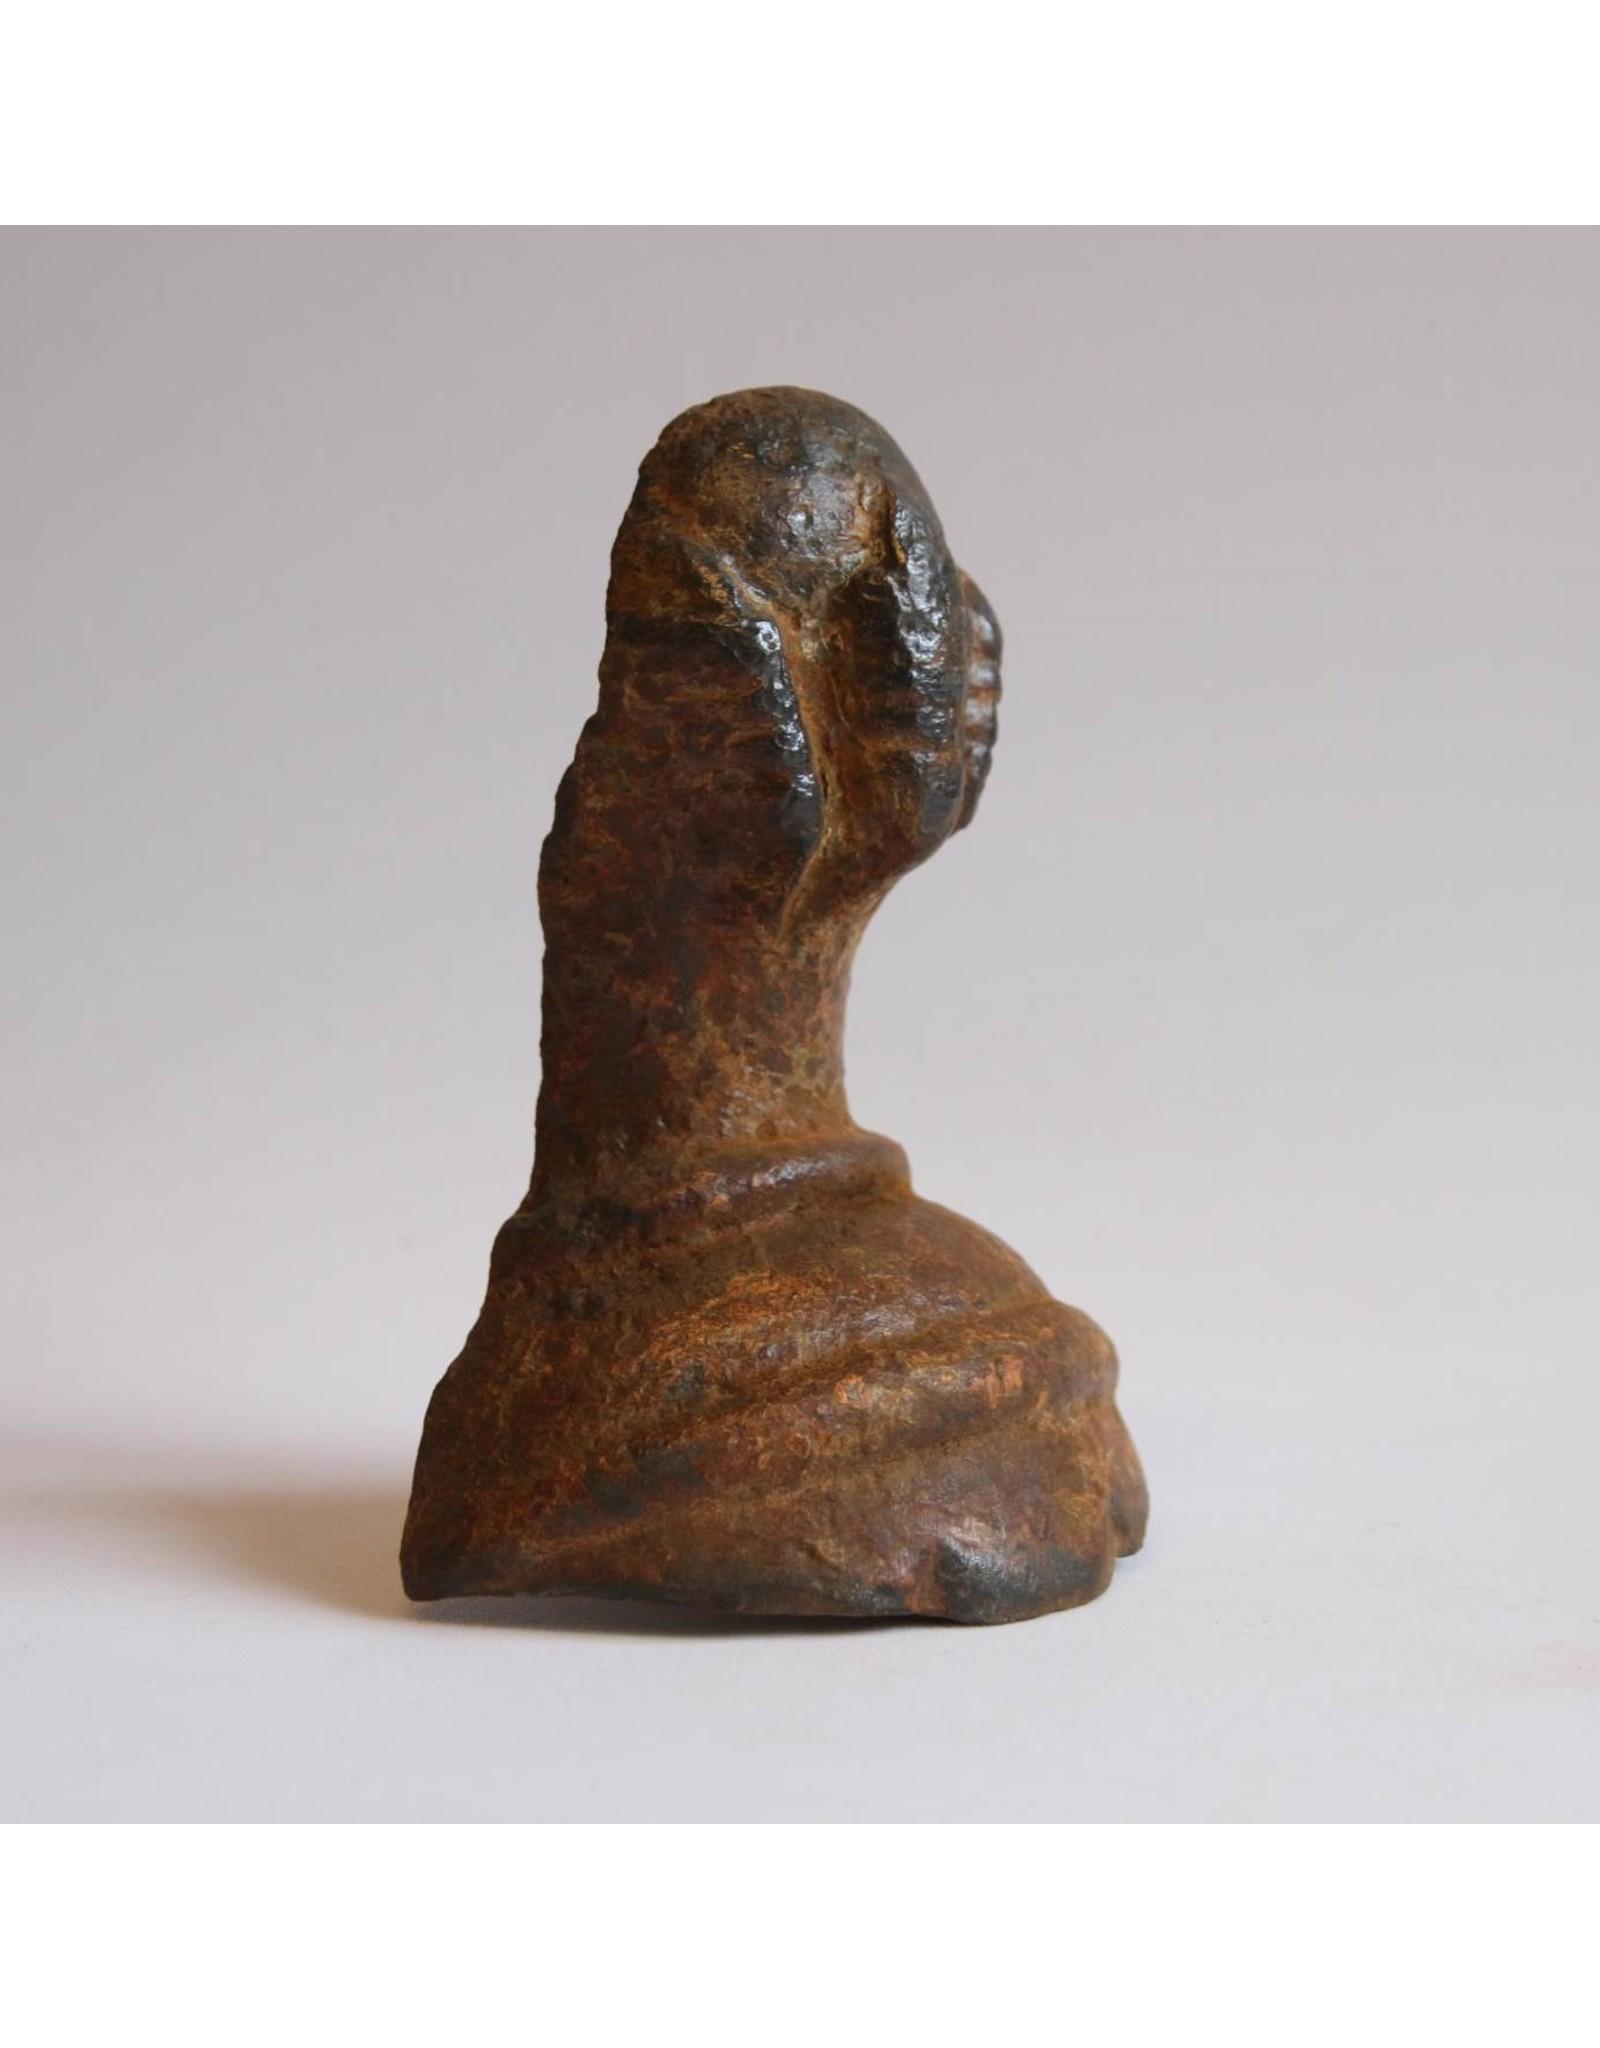 Clawfoot tub foot - cast iron, rusty